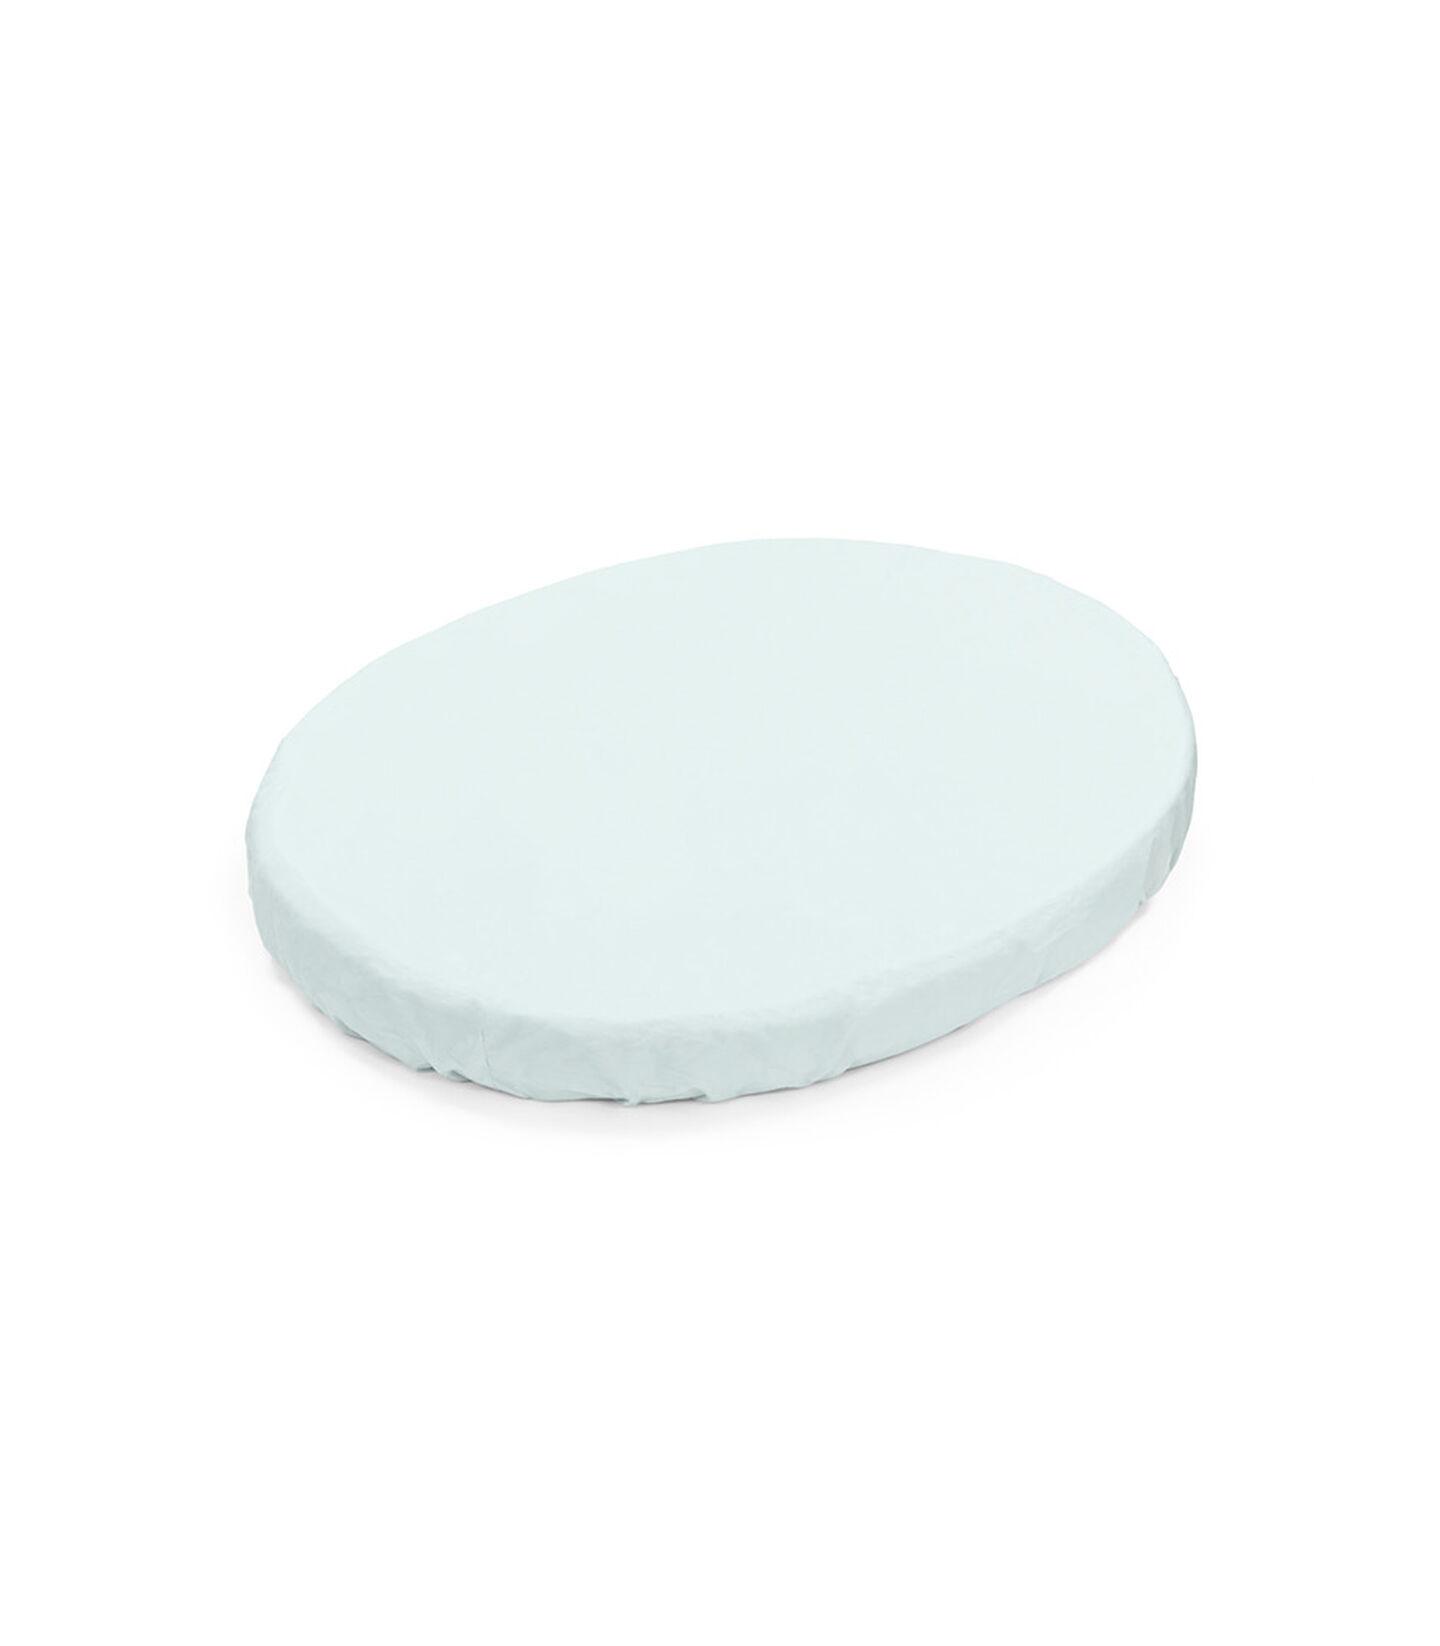 Lenzuolo con angoli Powder Blue Stokke® Sleepi™ Mini, Powder Blue, mainview view 1